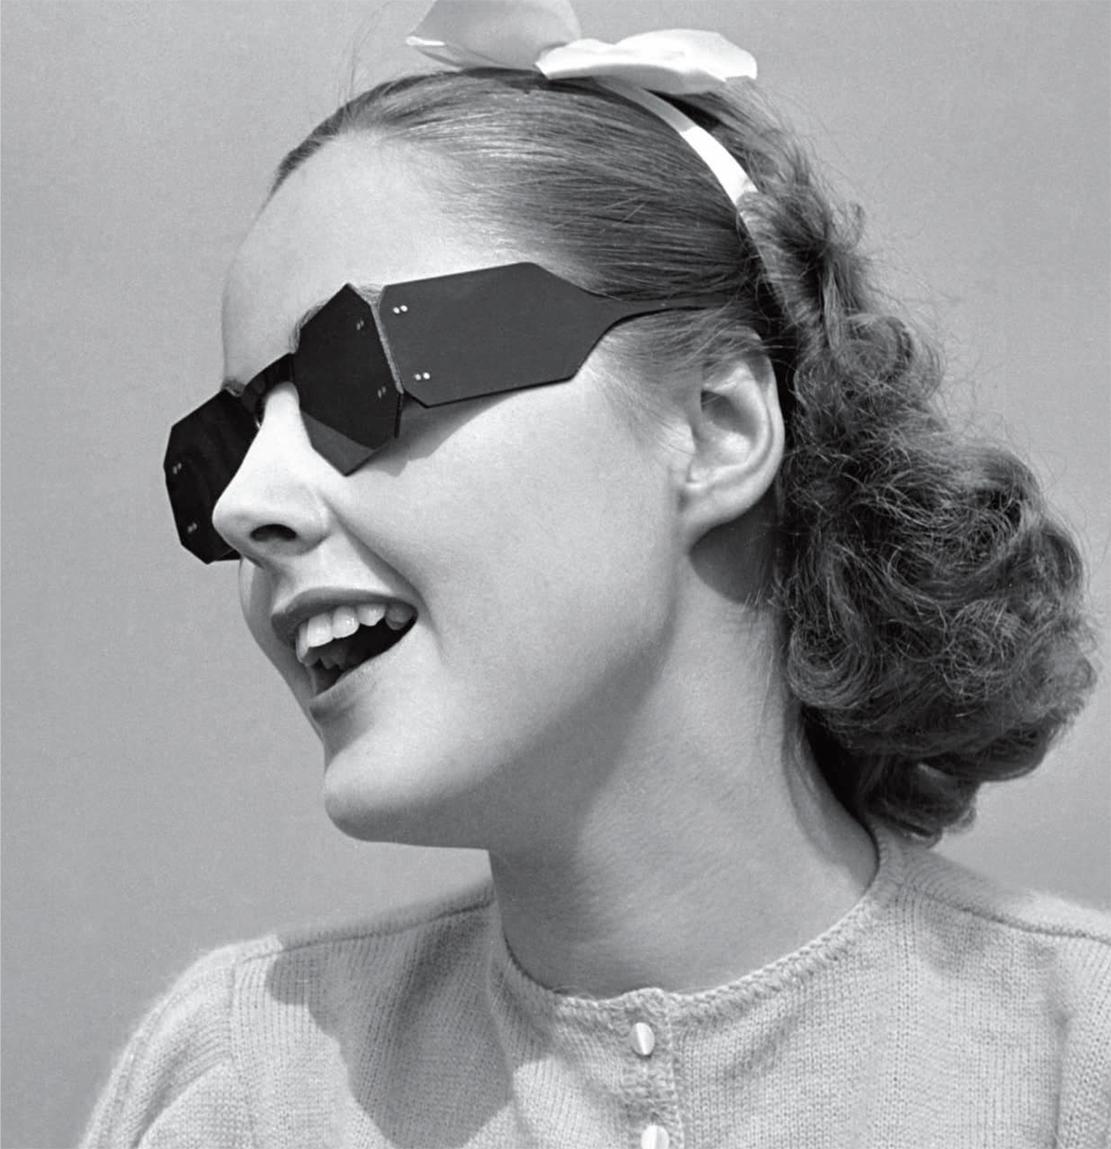 d2768b3ecf Vintage 1930 Sunglasses - Bitterroot Public Library